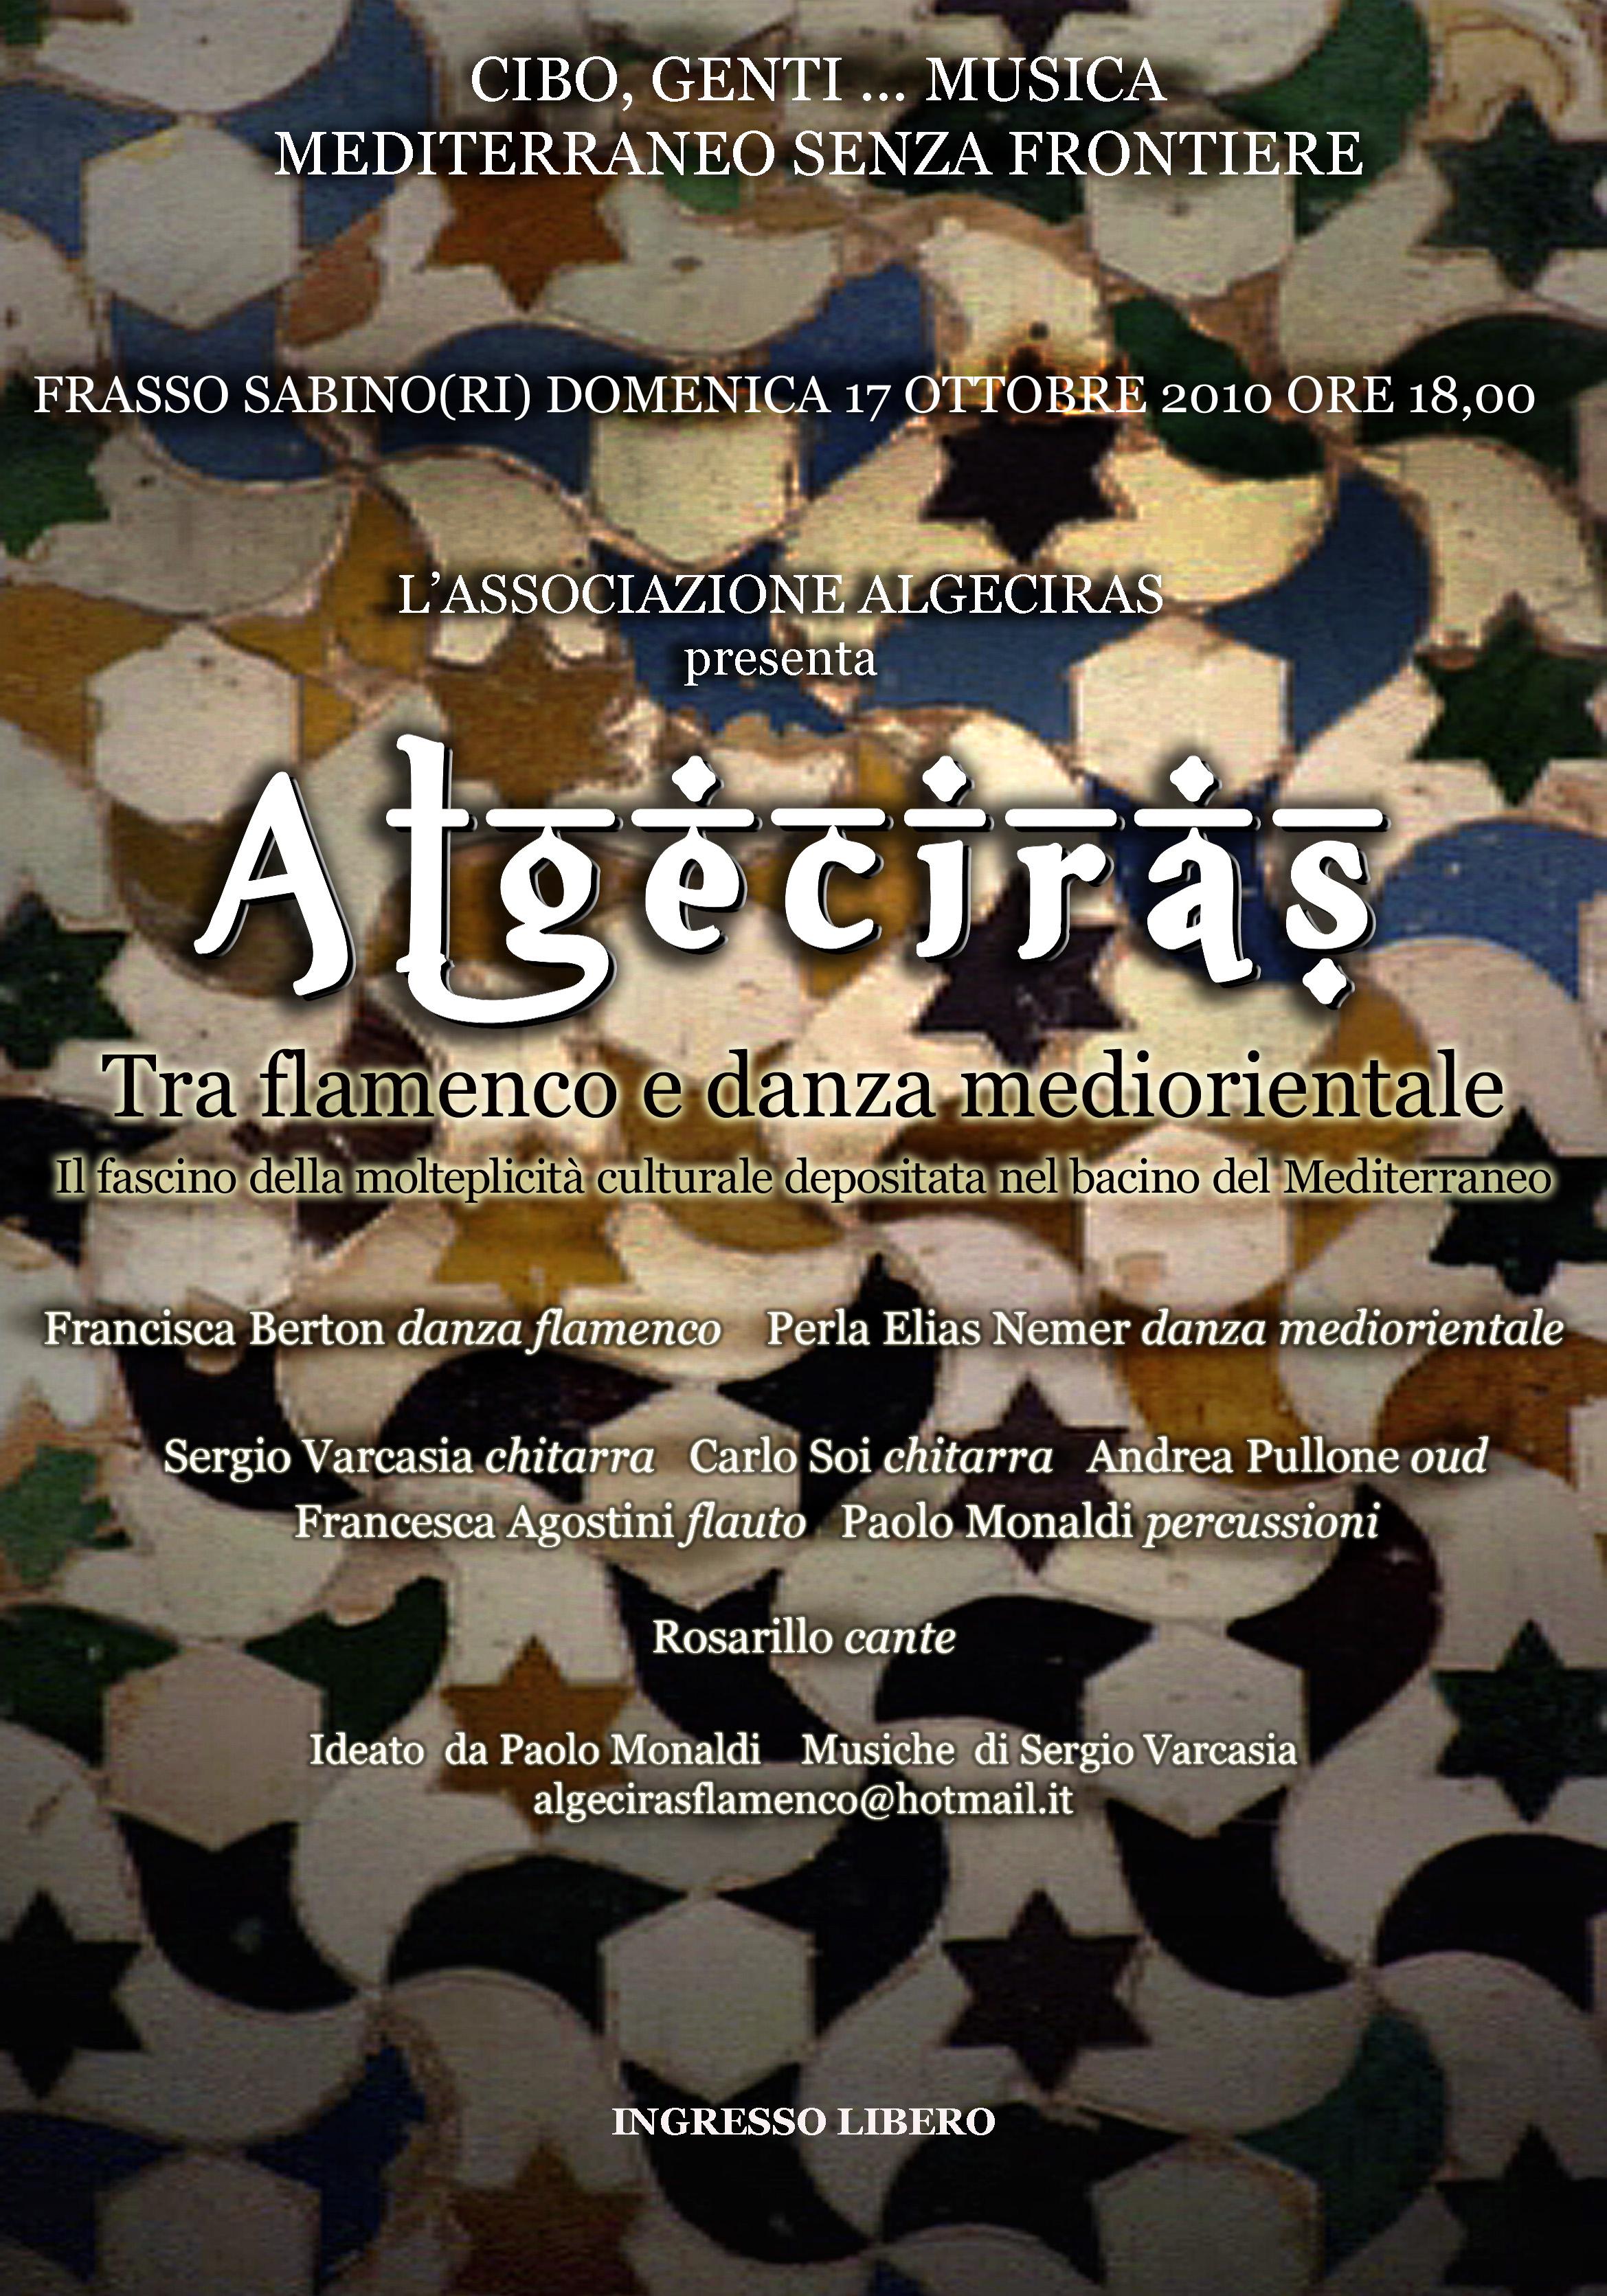 2010 Algeciras - Frasso Sabino